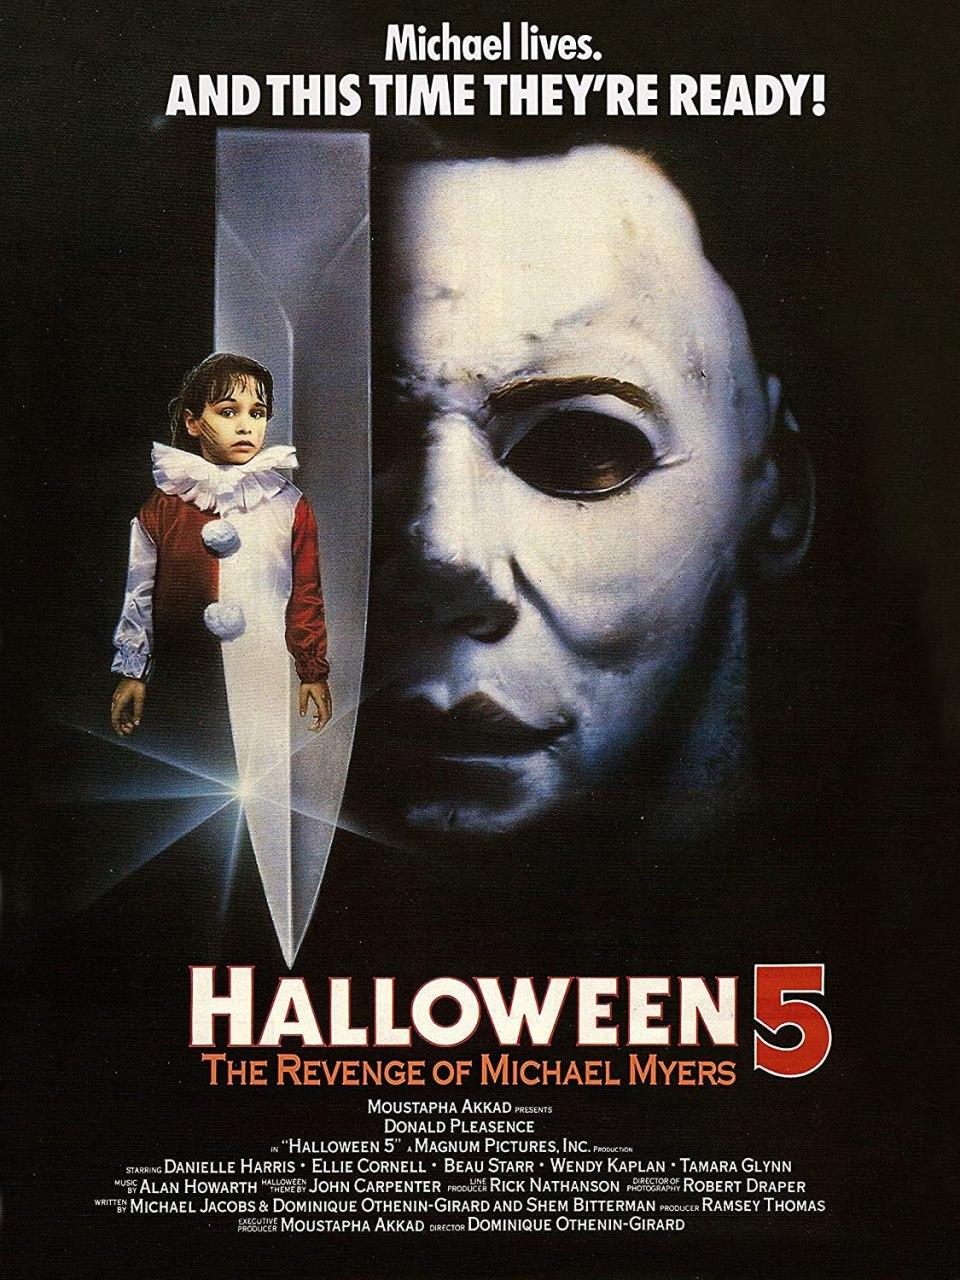 Halloween 5 The Revenge of Michael Myers